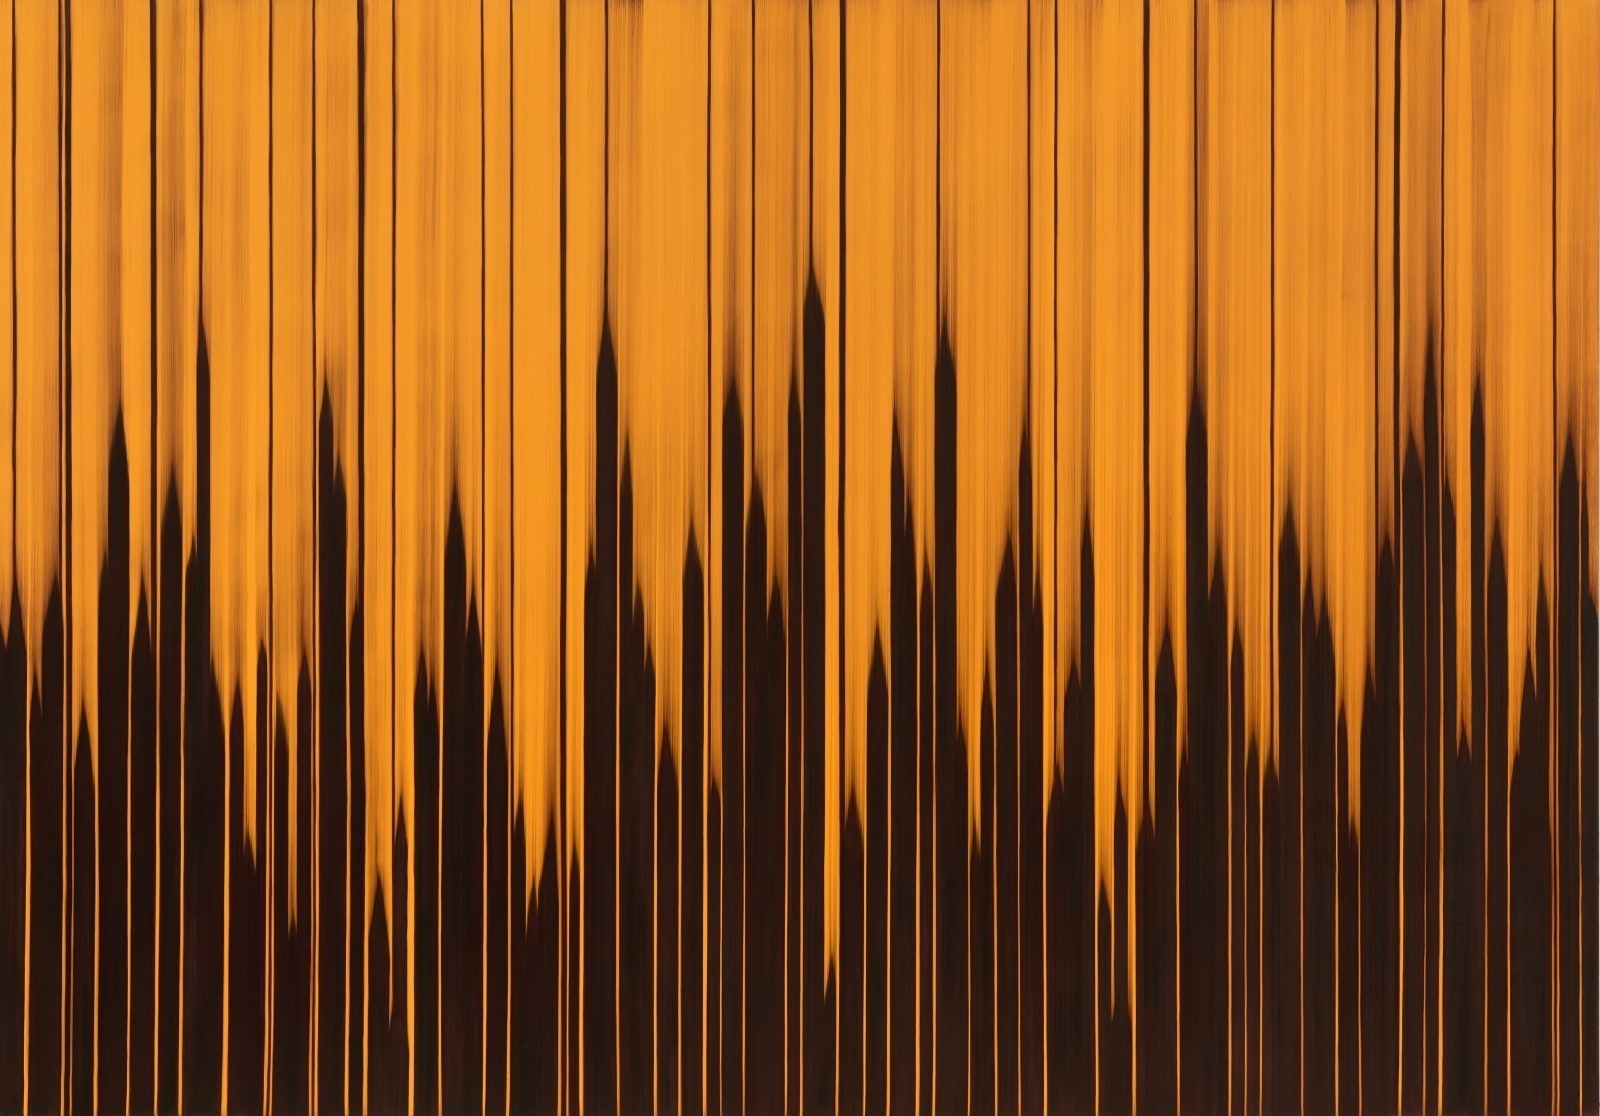 Sonic Dub, 2021, oil on canvas, 214x305cm